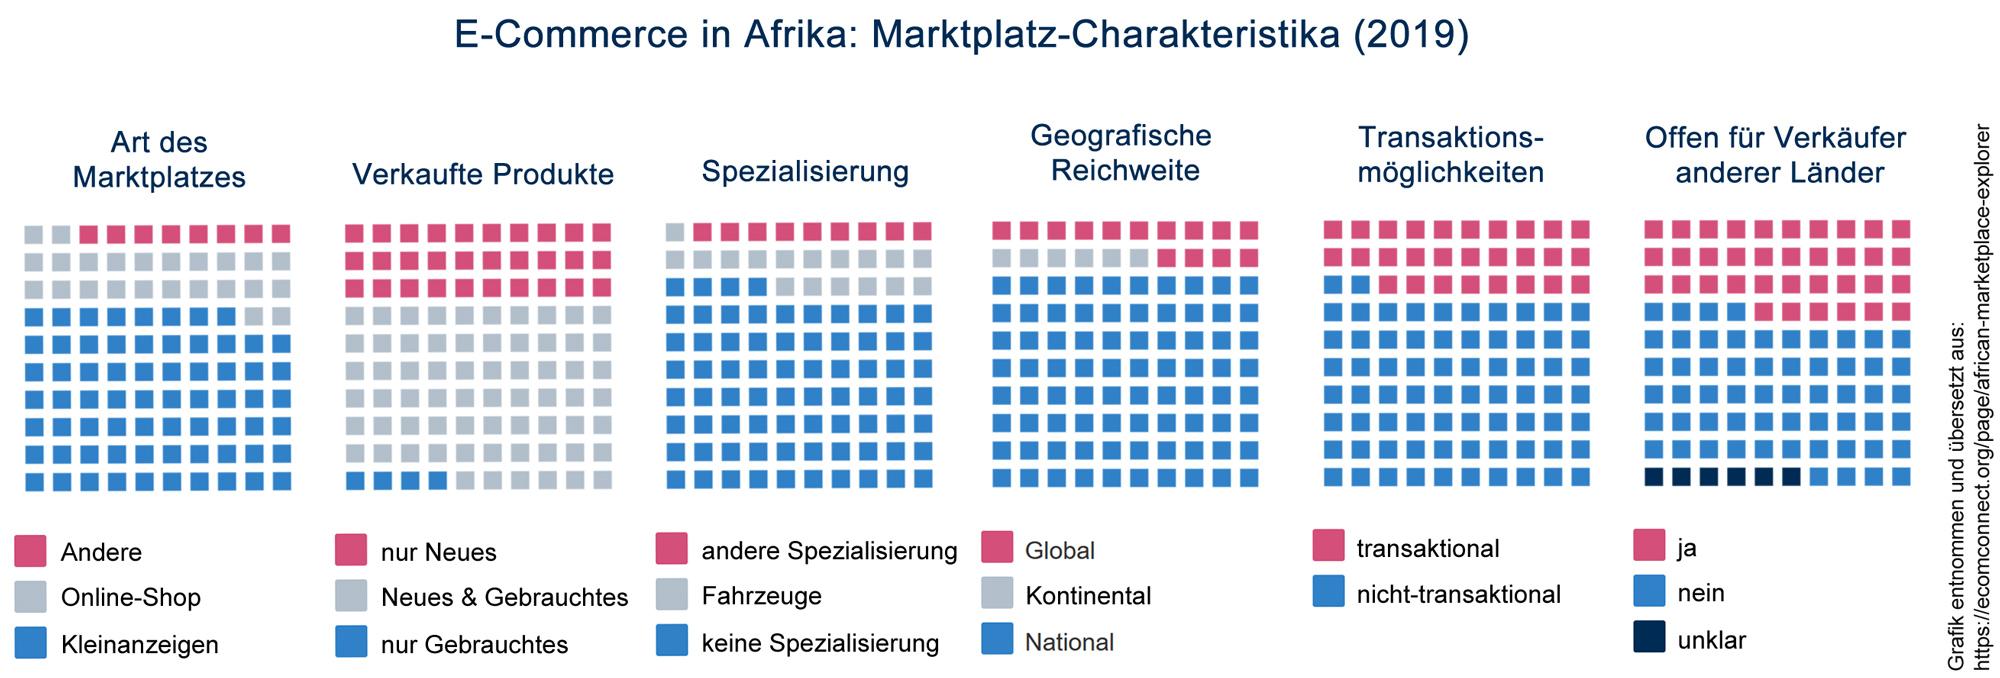 E-Commerce in Afrika: Marktplatz-Charakteristika